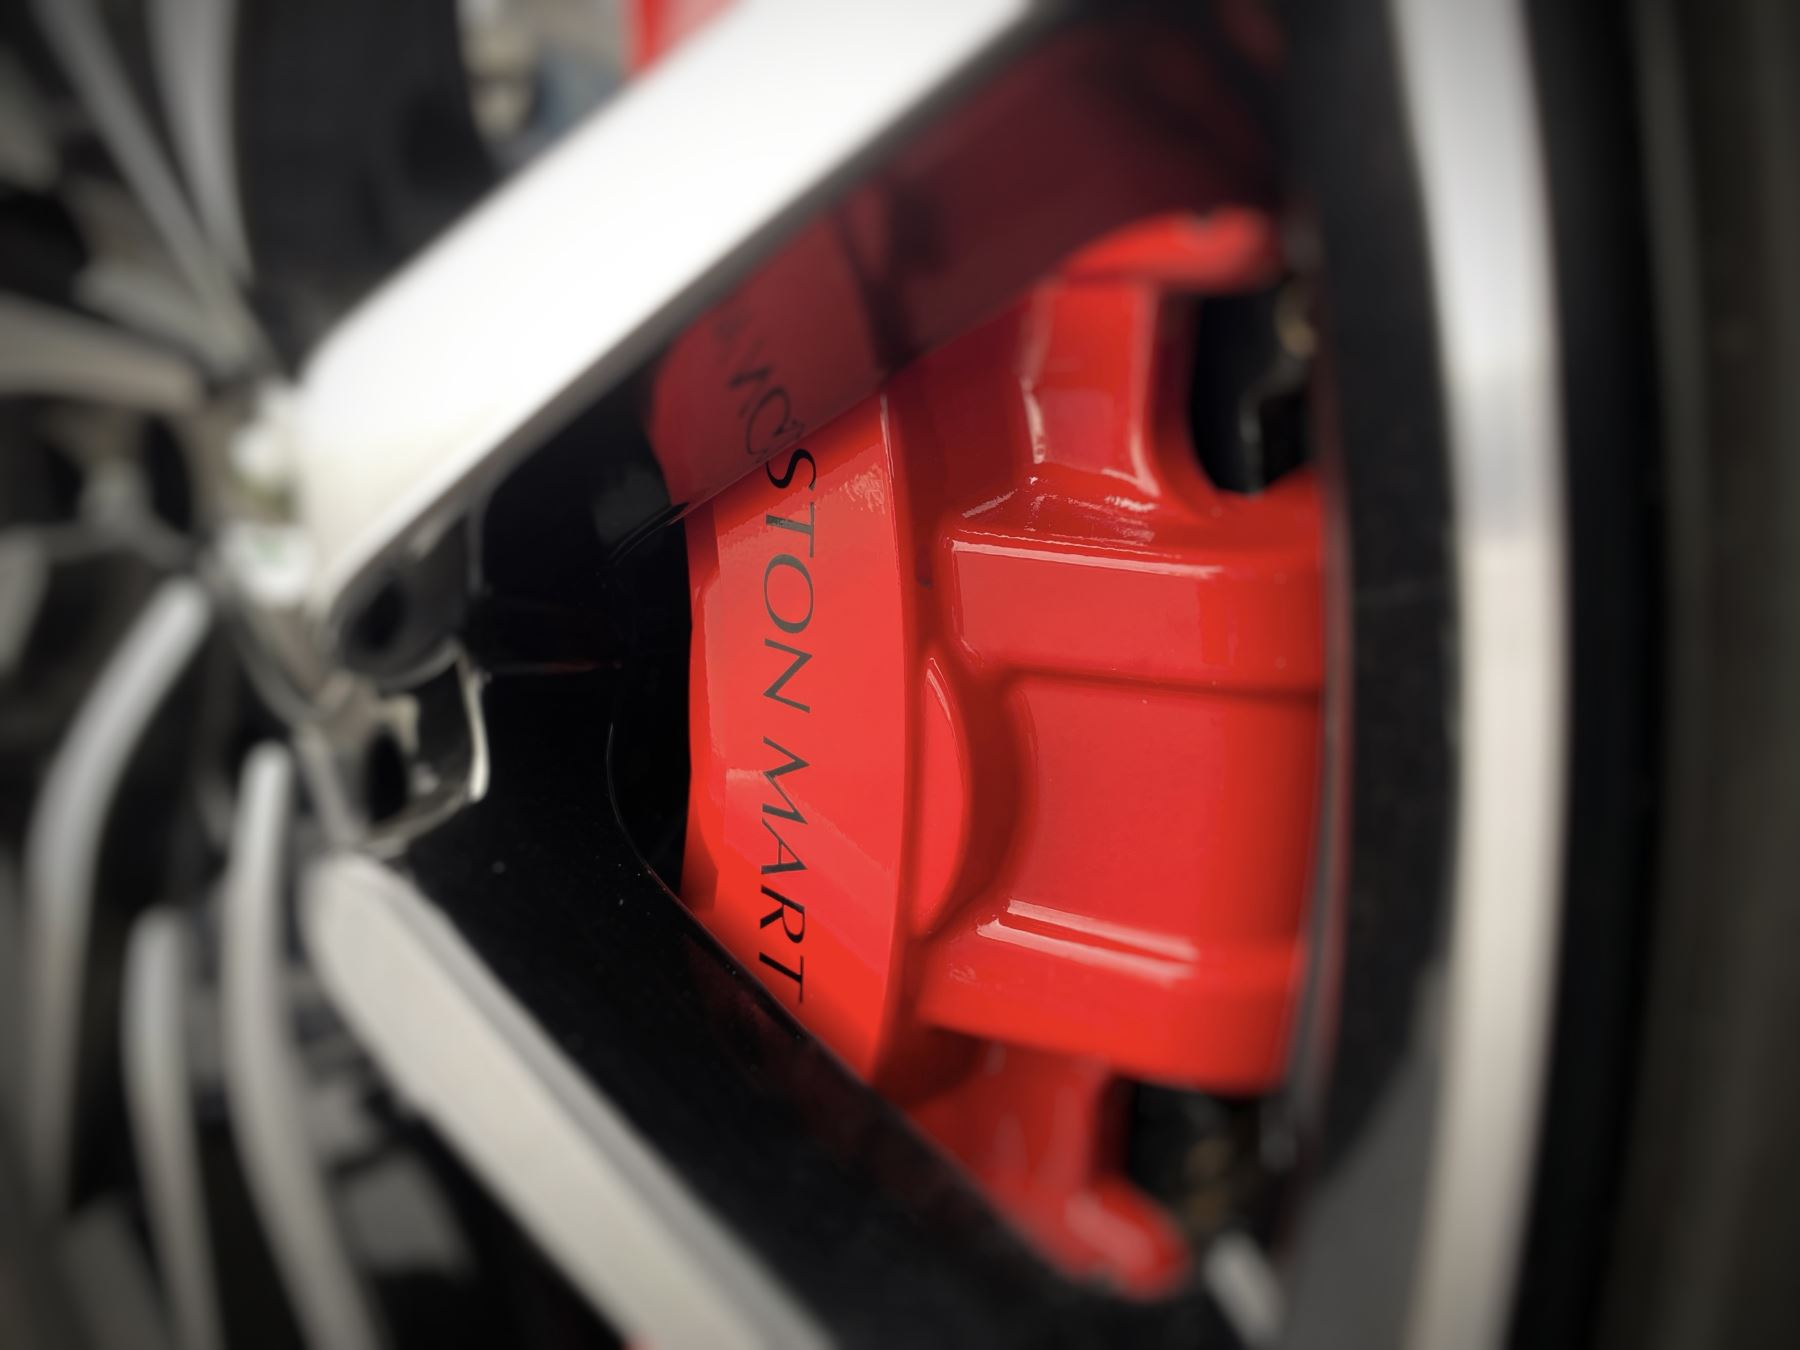 Aston Martin New Vantage 2dr ZF 8 Speed Auto. 4.0 Twin Turbo ZF Gearbox  Reversing Camera Heated Seats Ceramic Brakes image 14